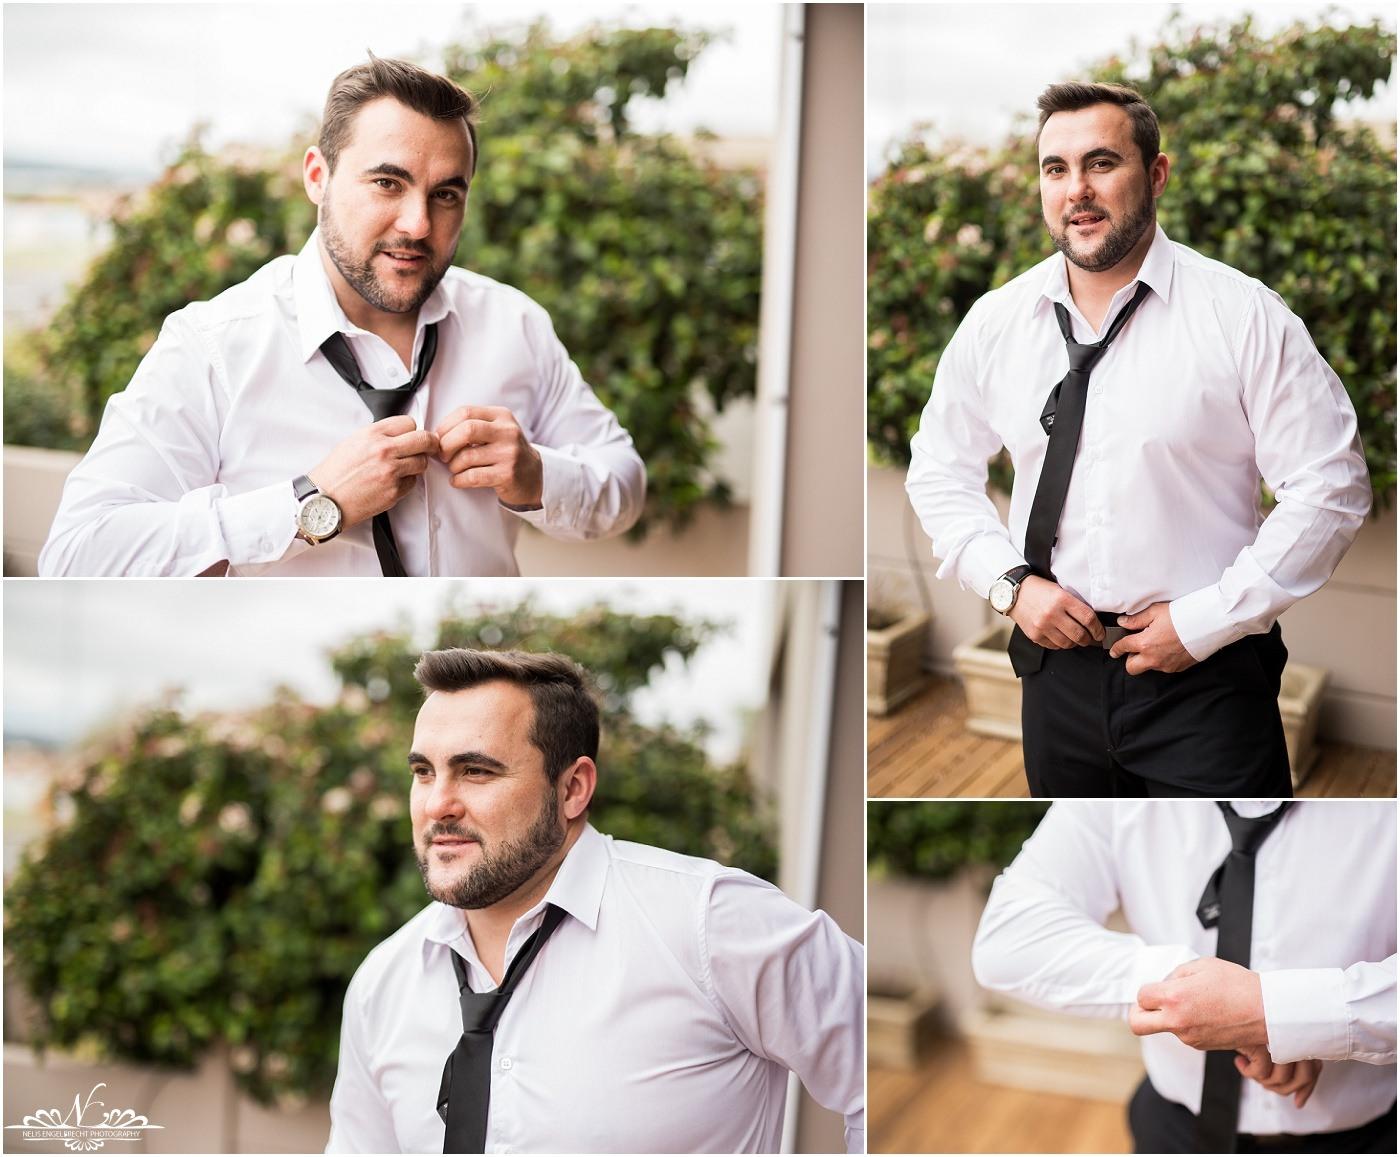 Eensgezind-Wedding-Photos-Nelis-Engelbrecht-Photography-008